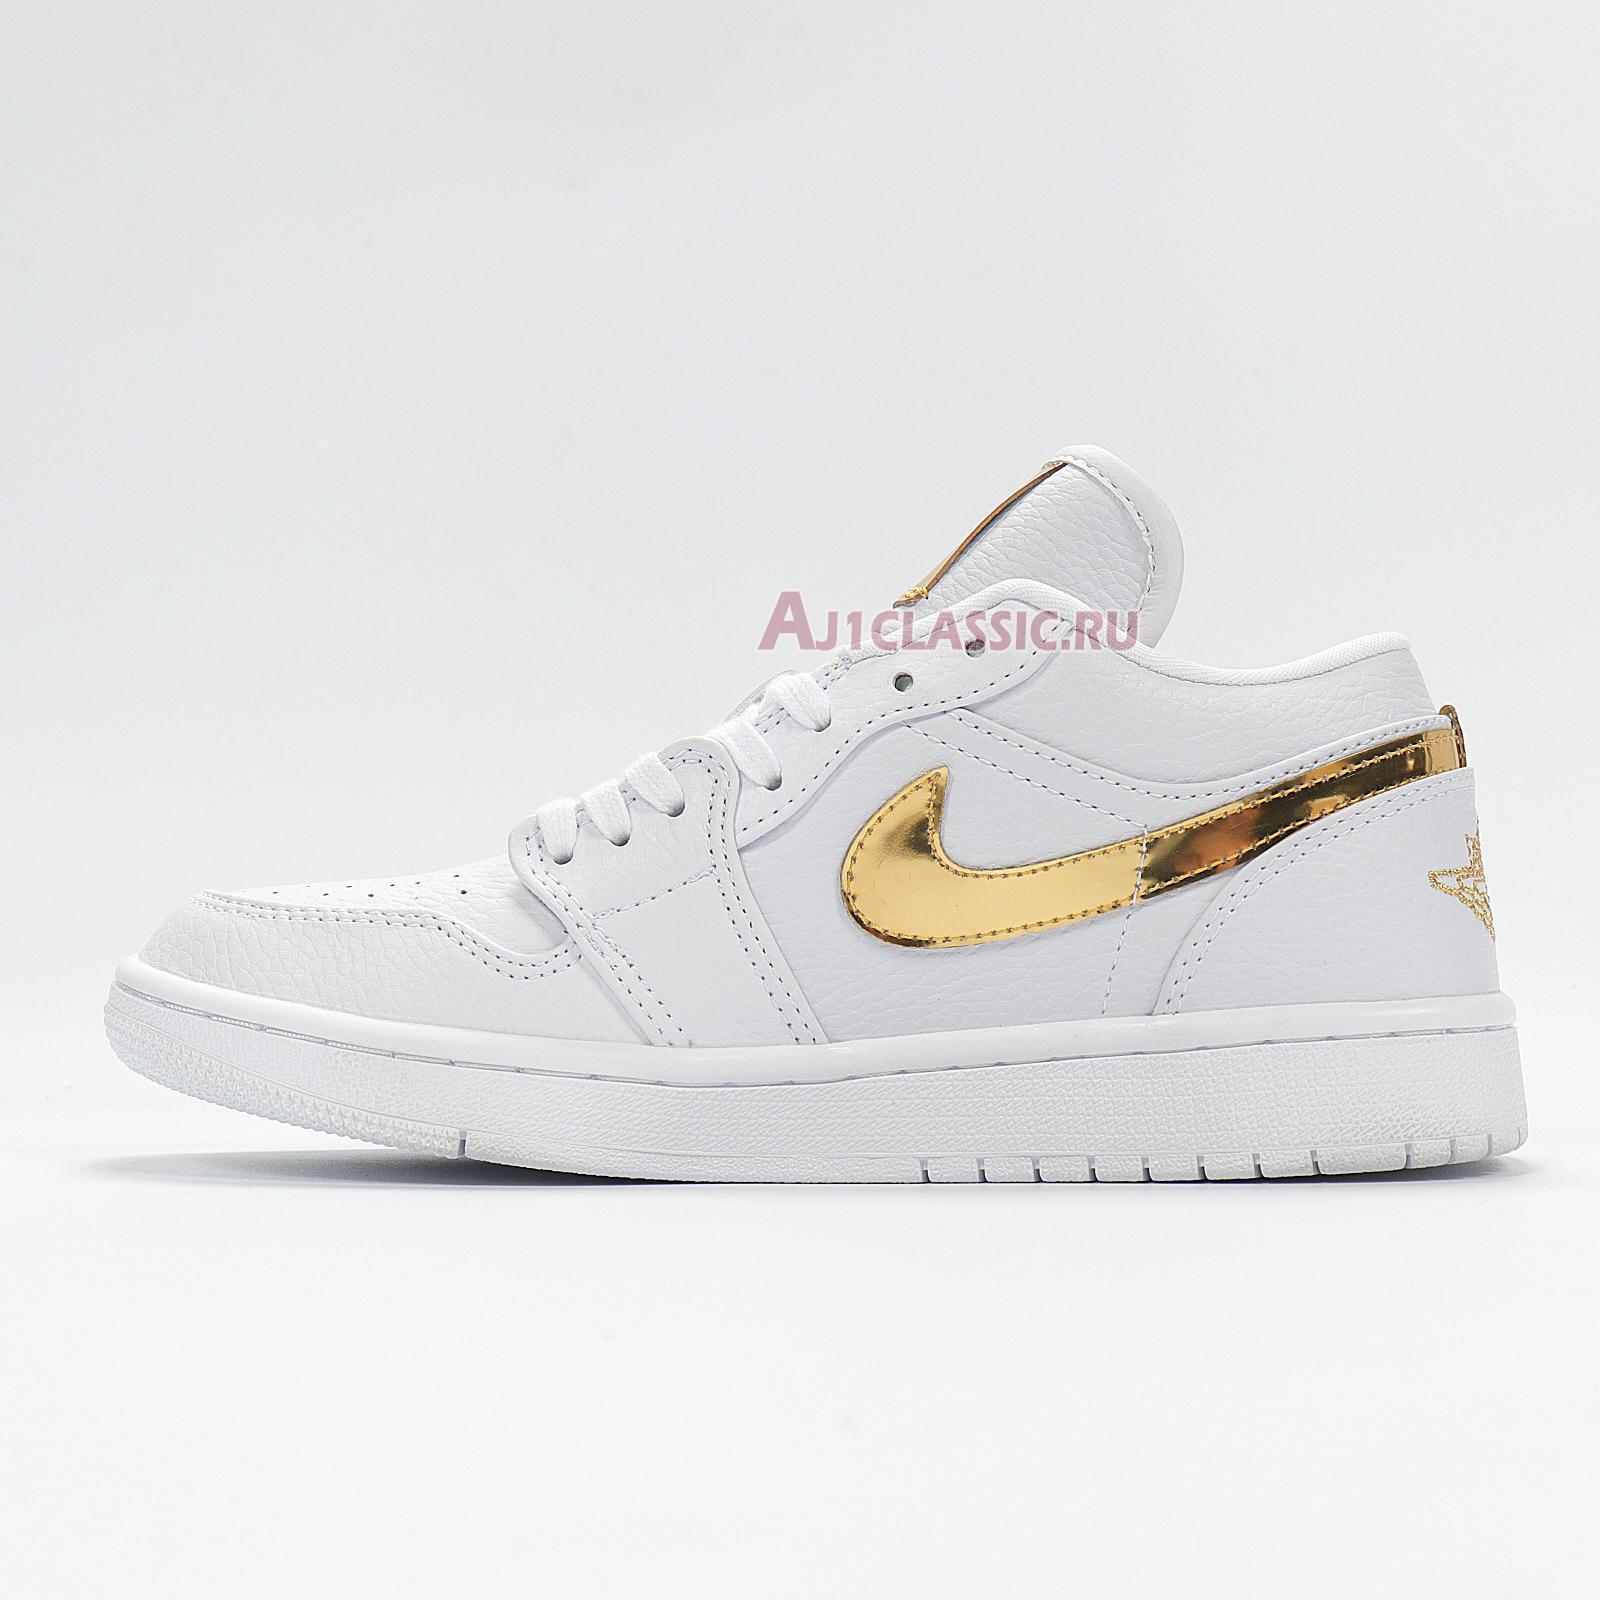 "Air Jordan 1 Retro Low ""White Metallic Gold"" CZ4776-100"